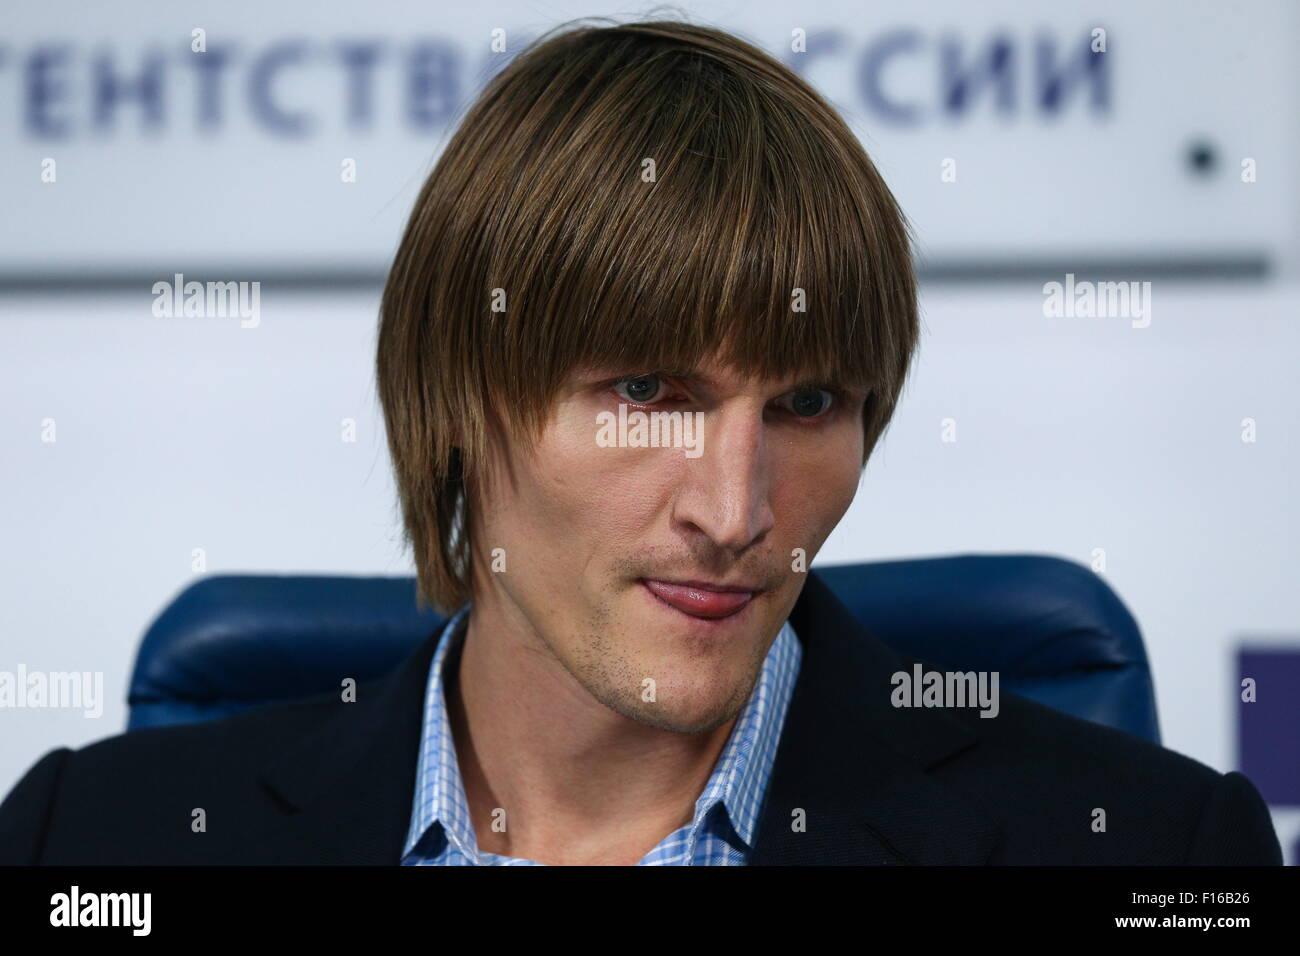 Andrei Kirilenko Stock Photos   Andrei Kirilenko Stock Images - Alamy a88a77b11